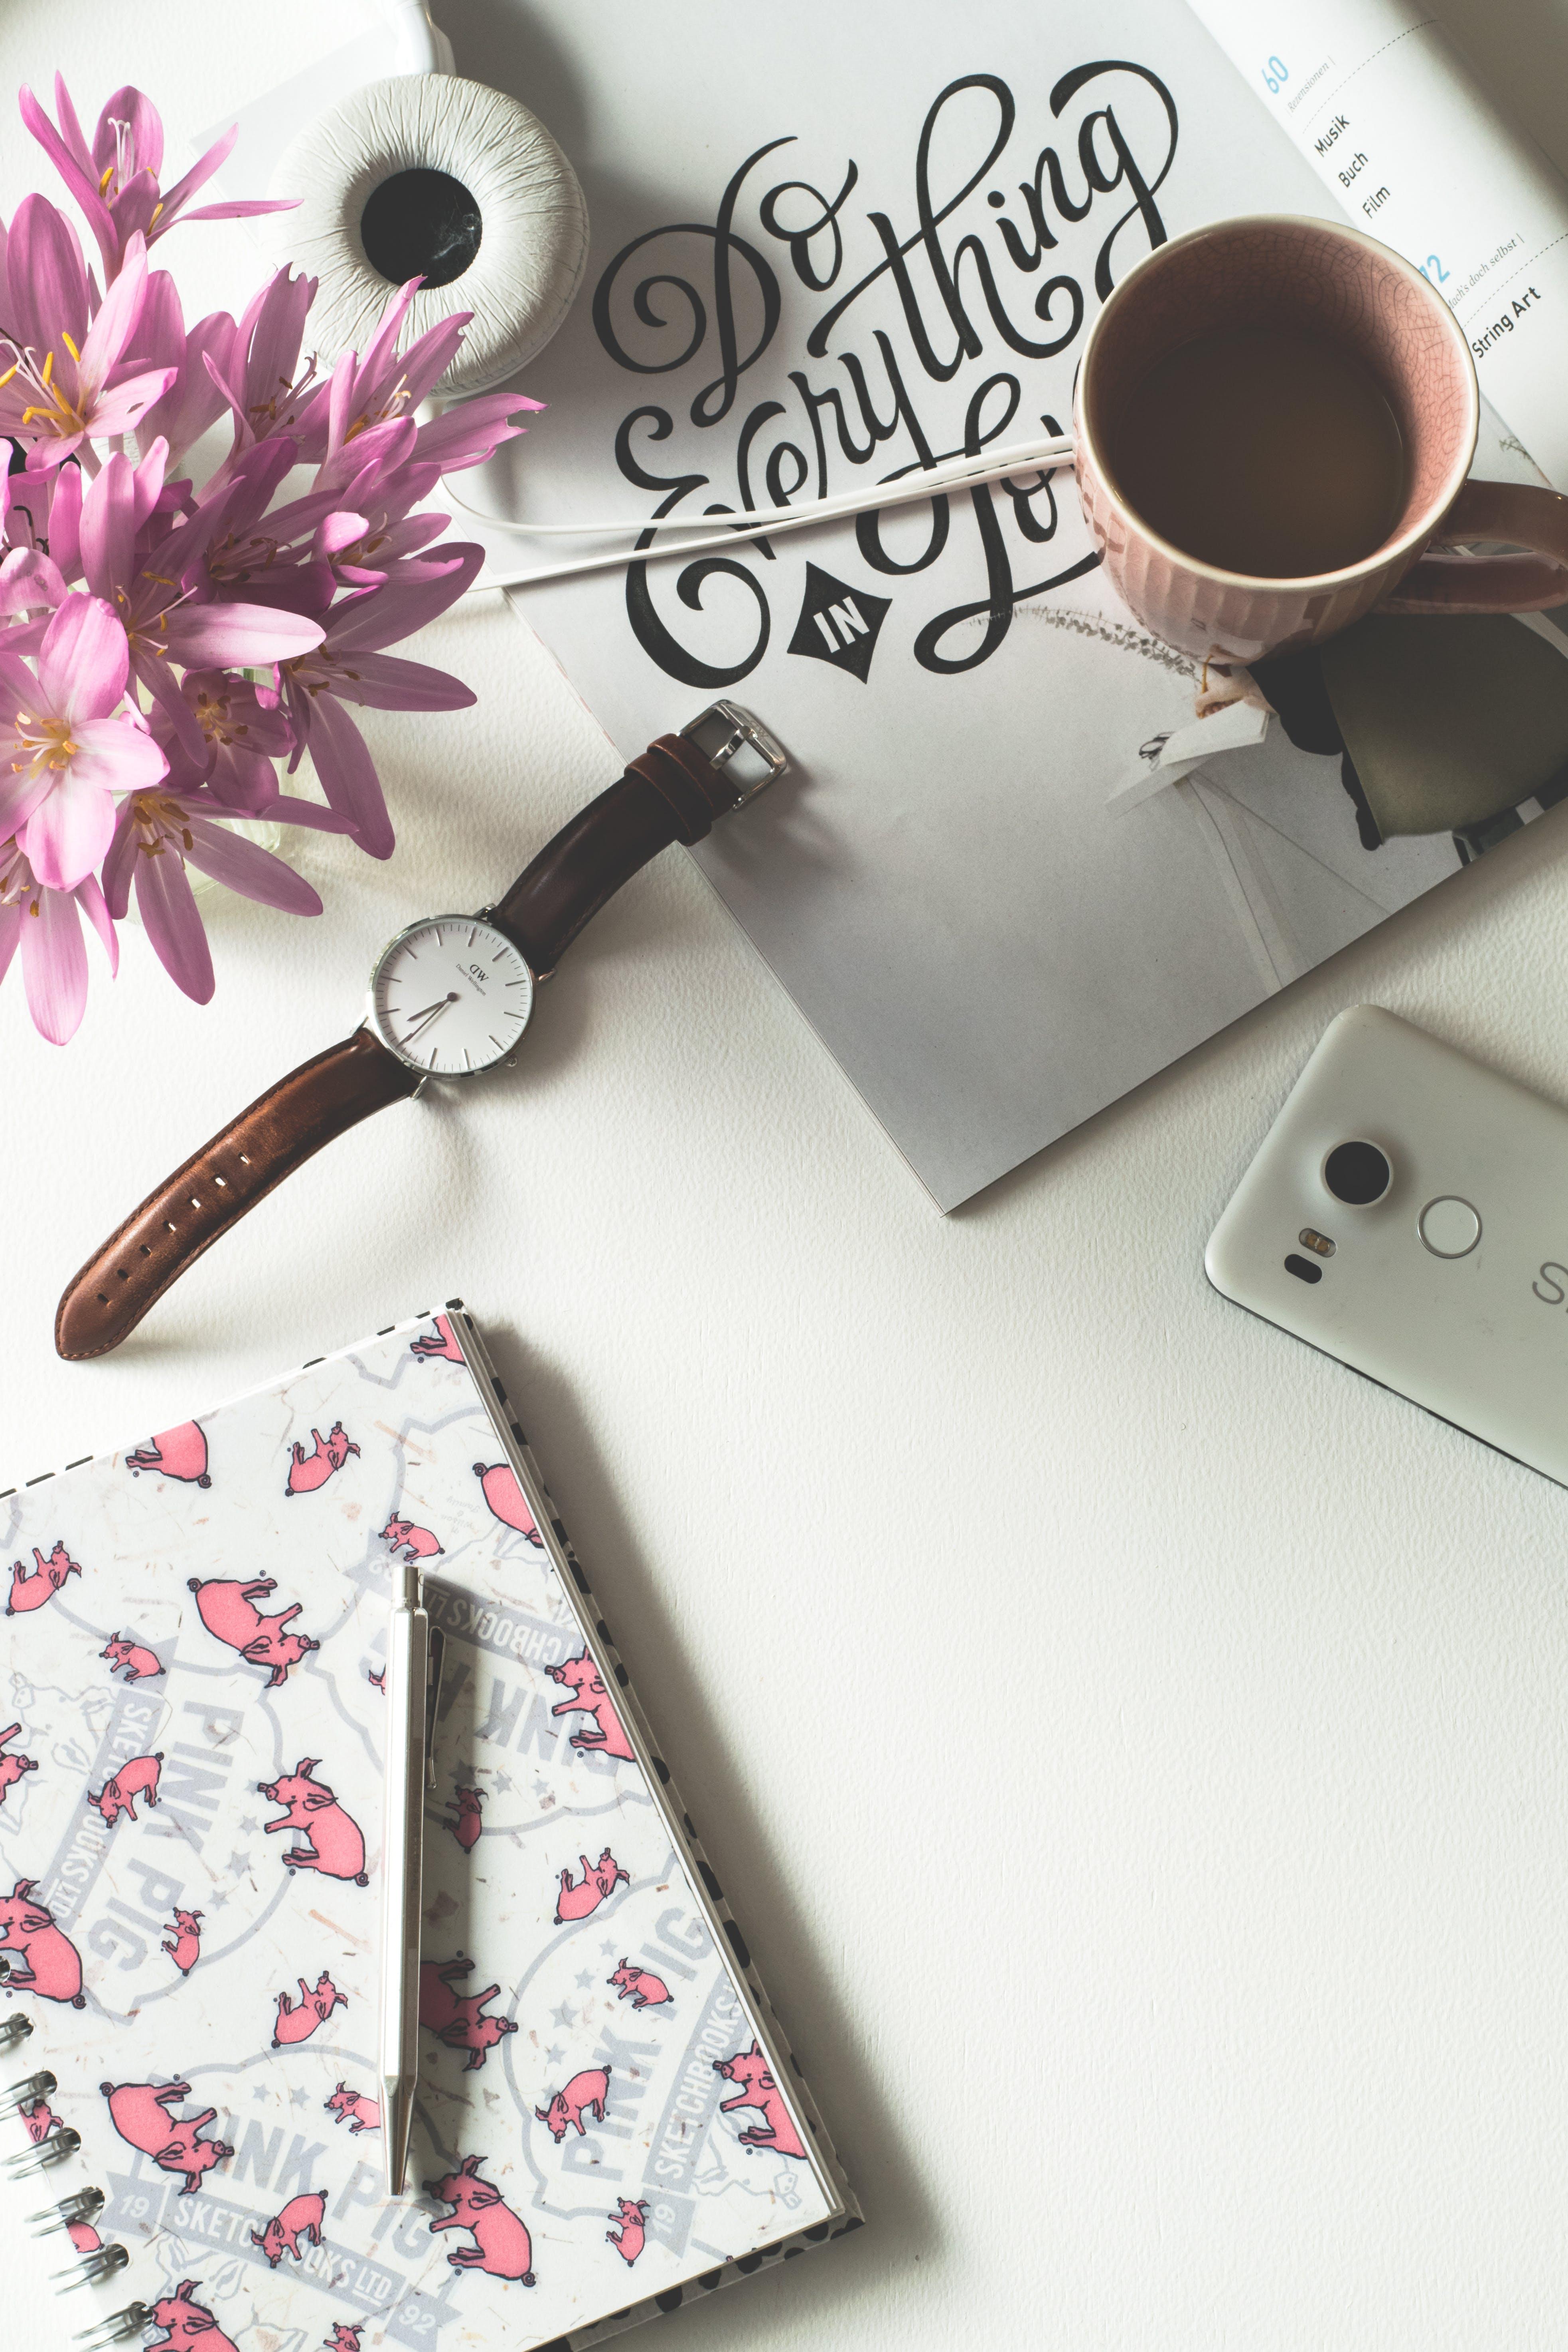 accessories, caffeine, coffee